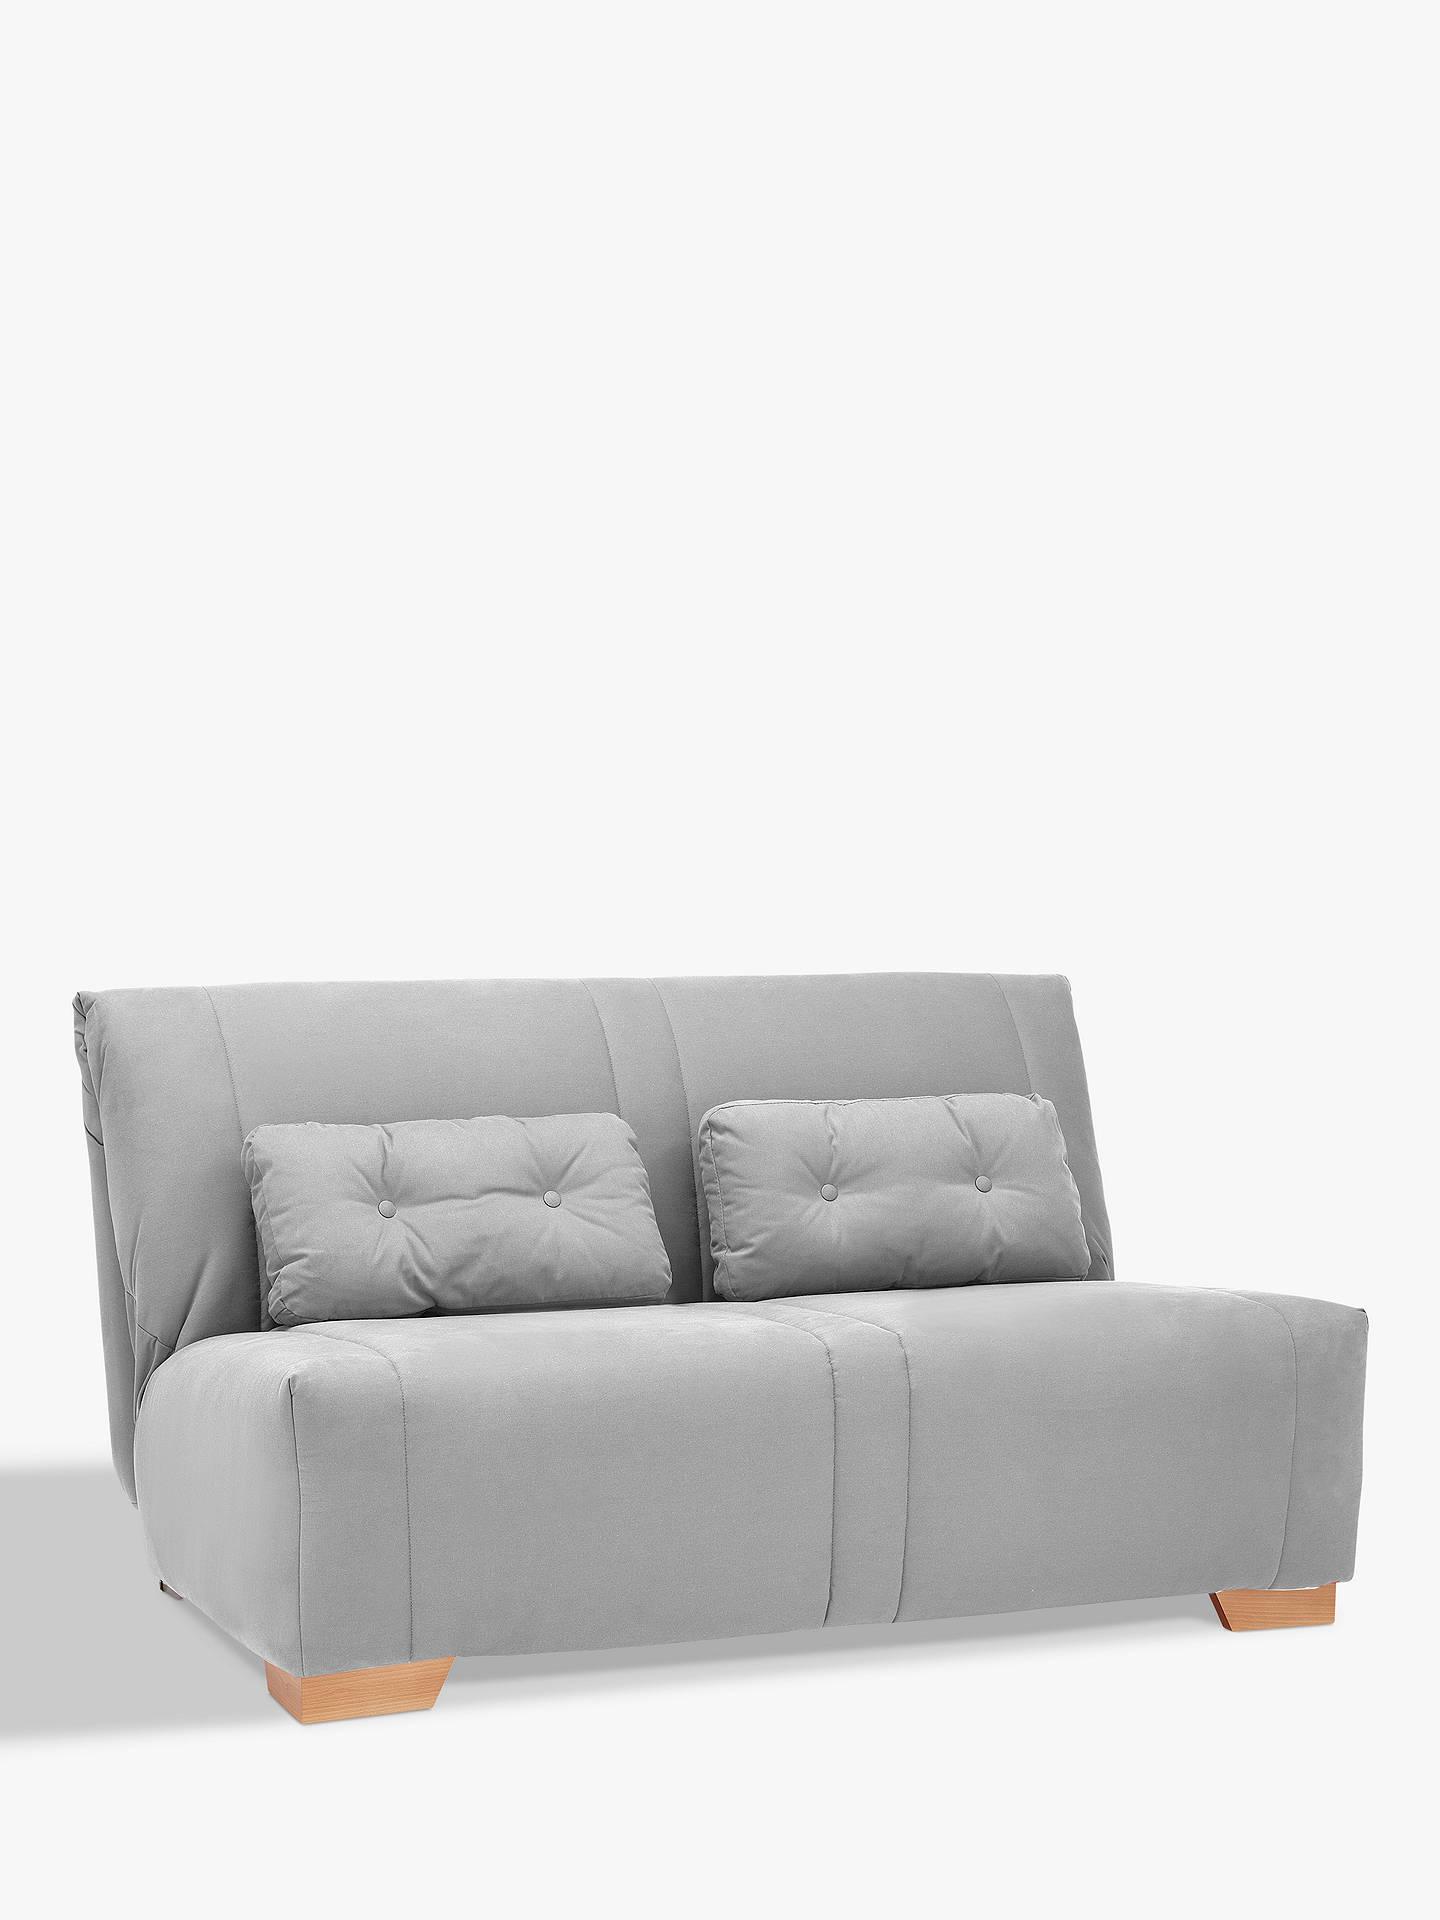 John Lewis & Partners Strauss Large Sofa Bed